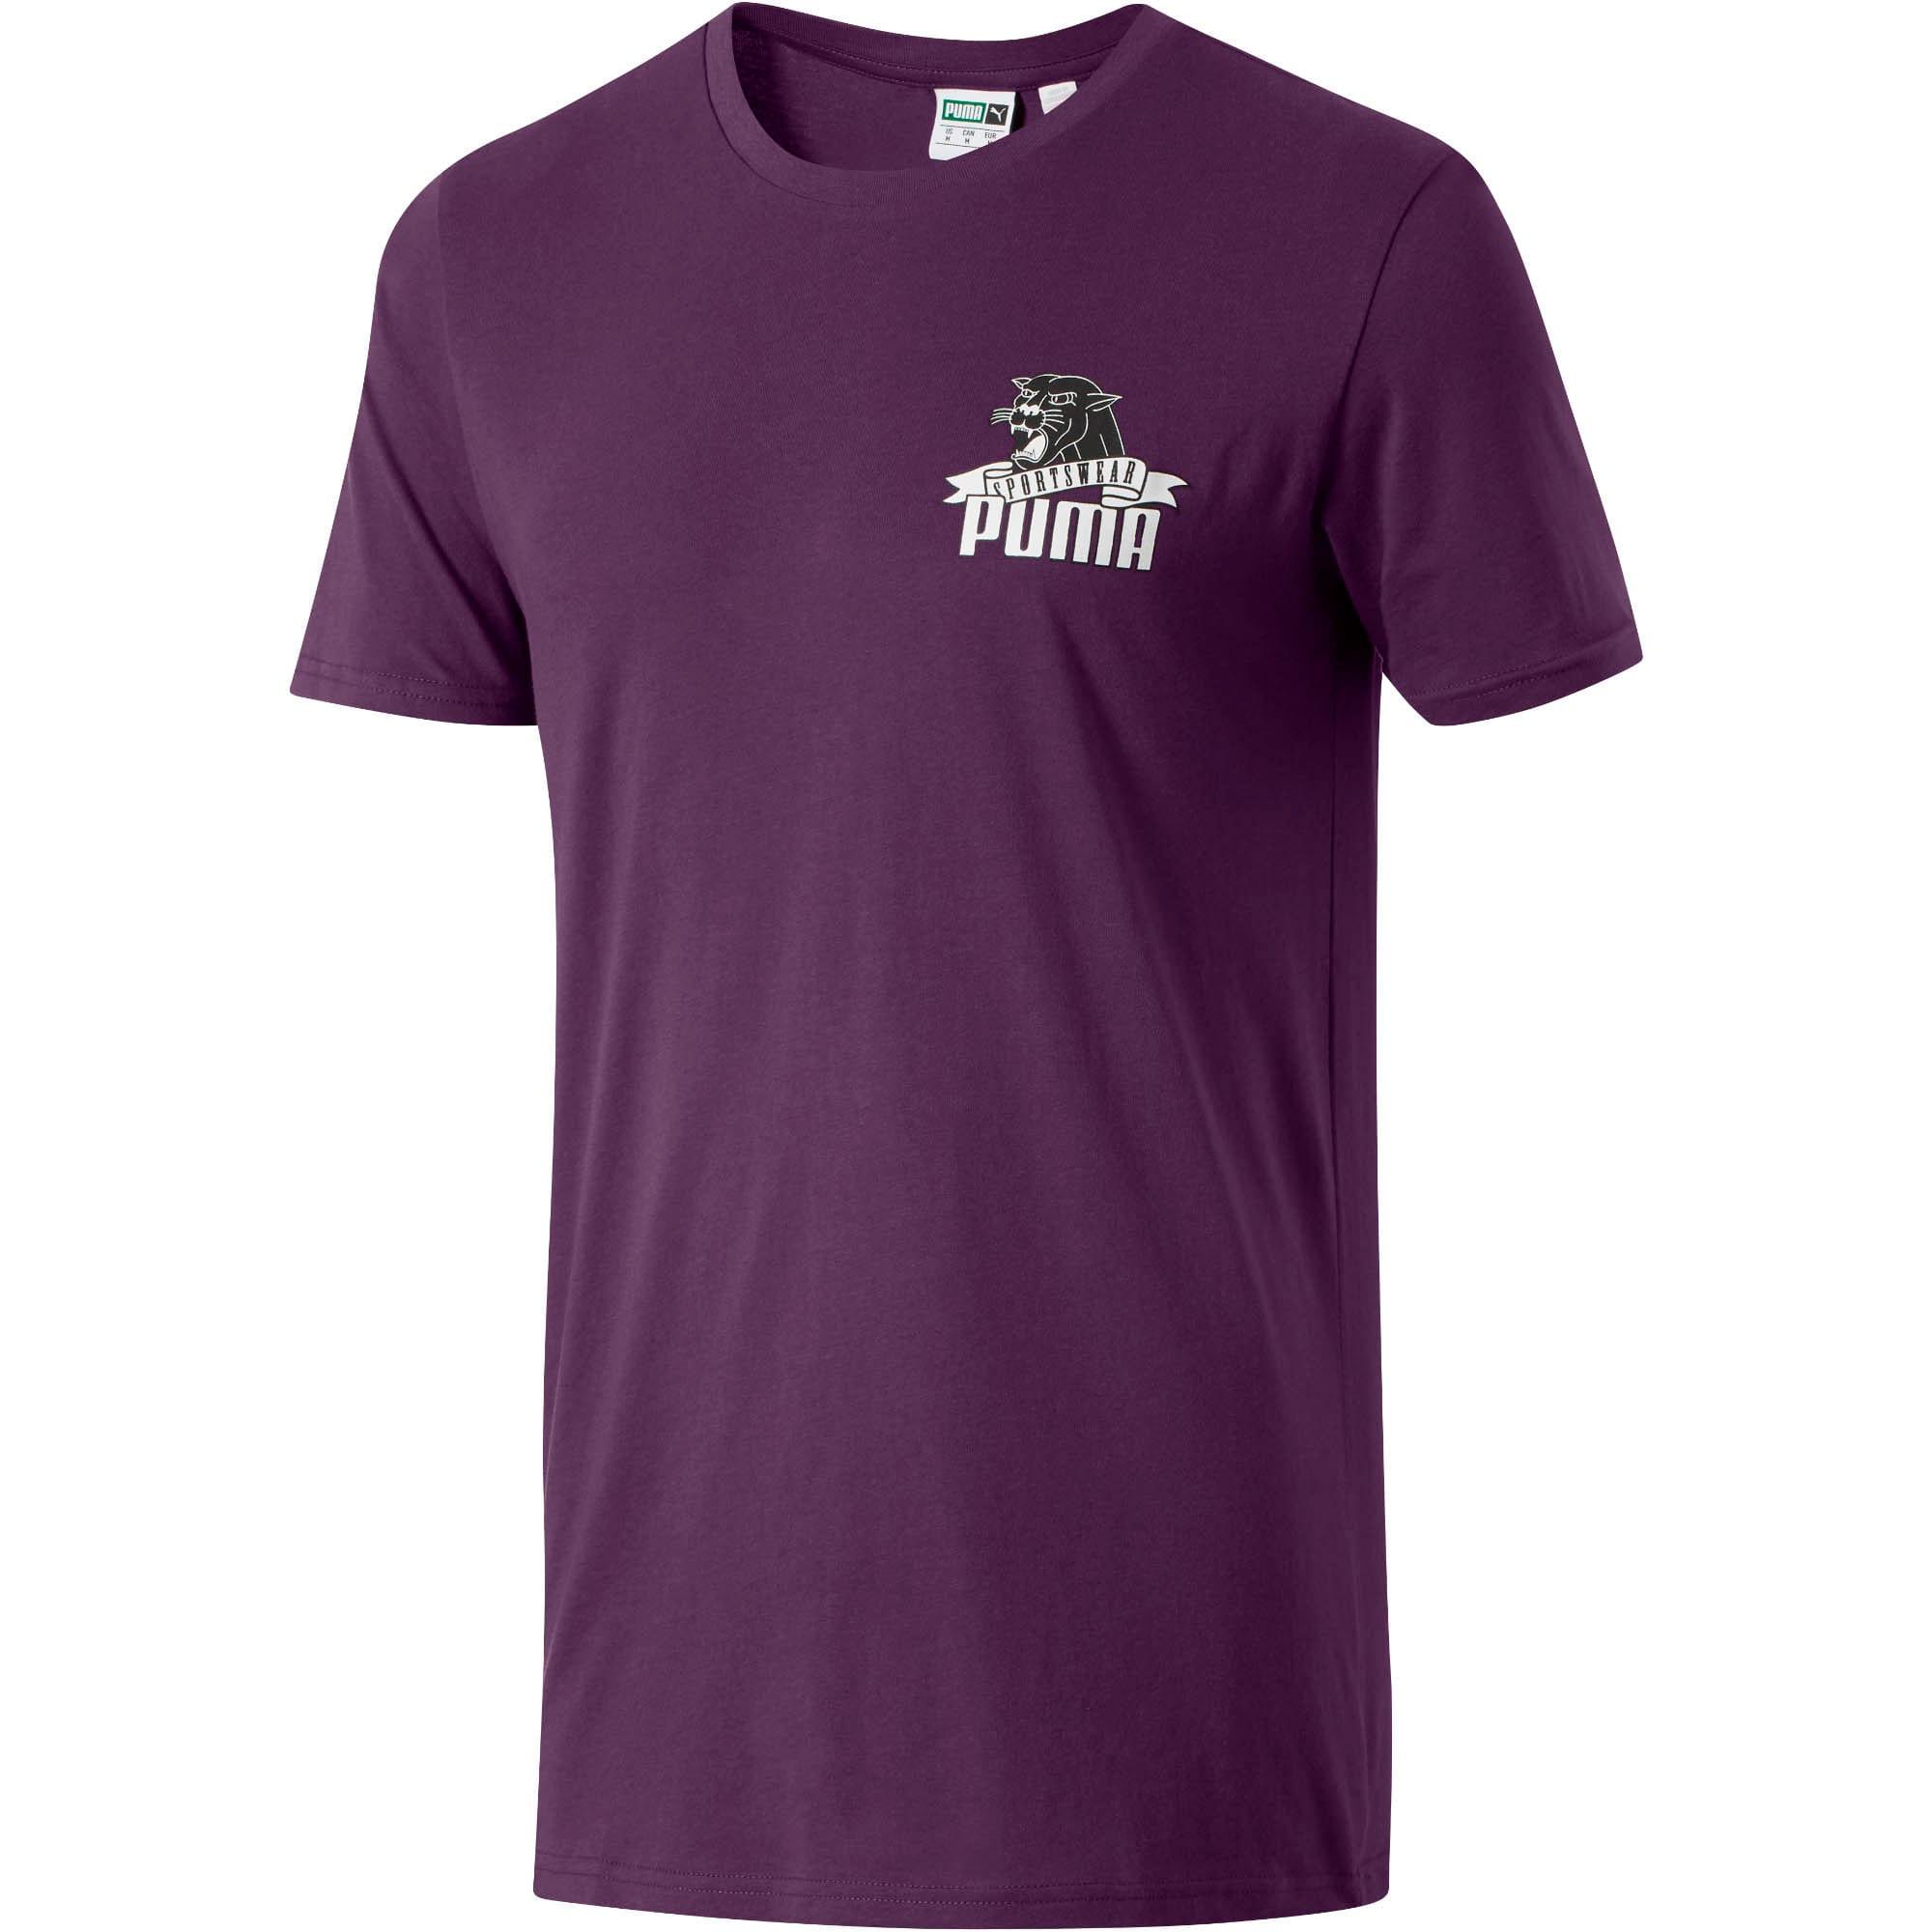 Thumbnail 1 of Graphic Downtown Flock Print T-Shirt, Shadow Purple, medium